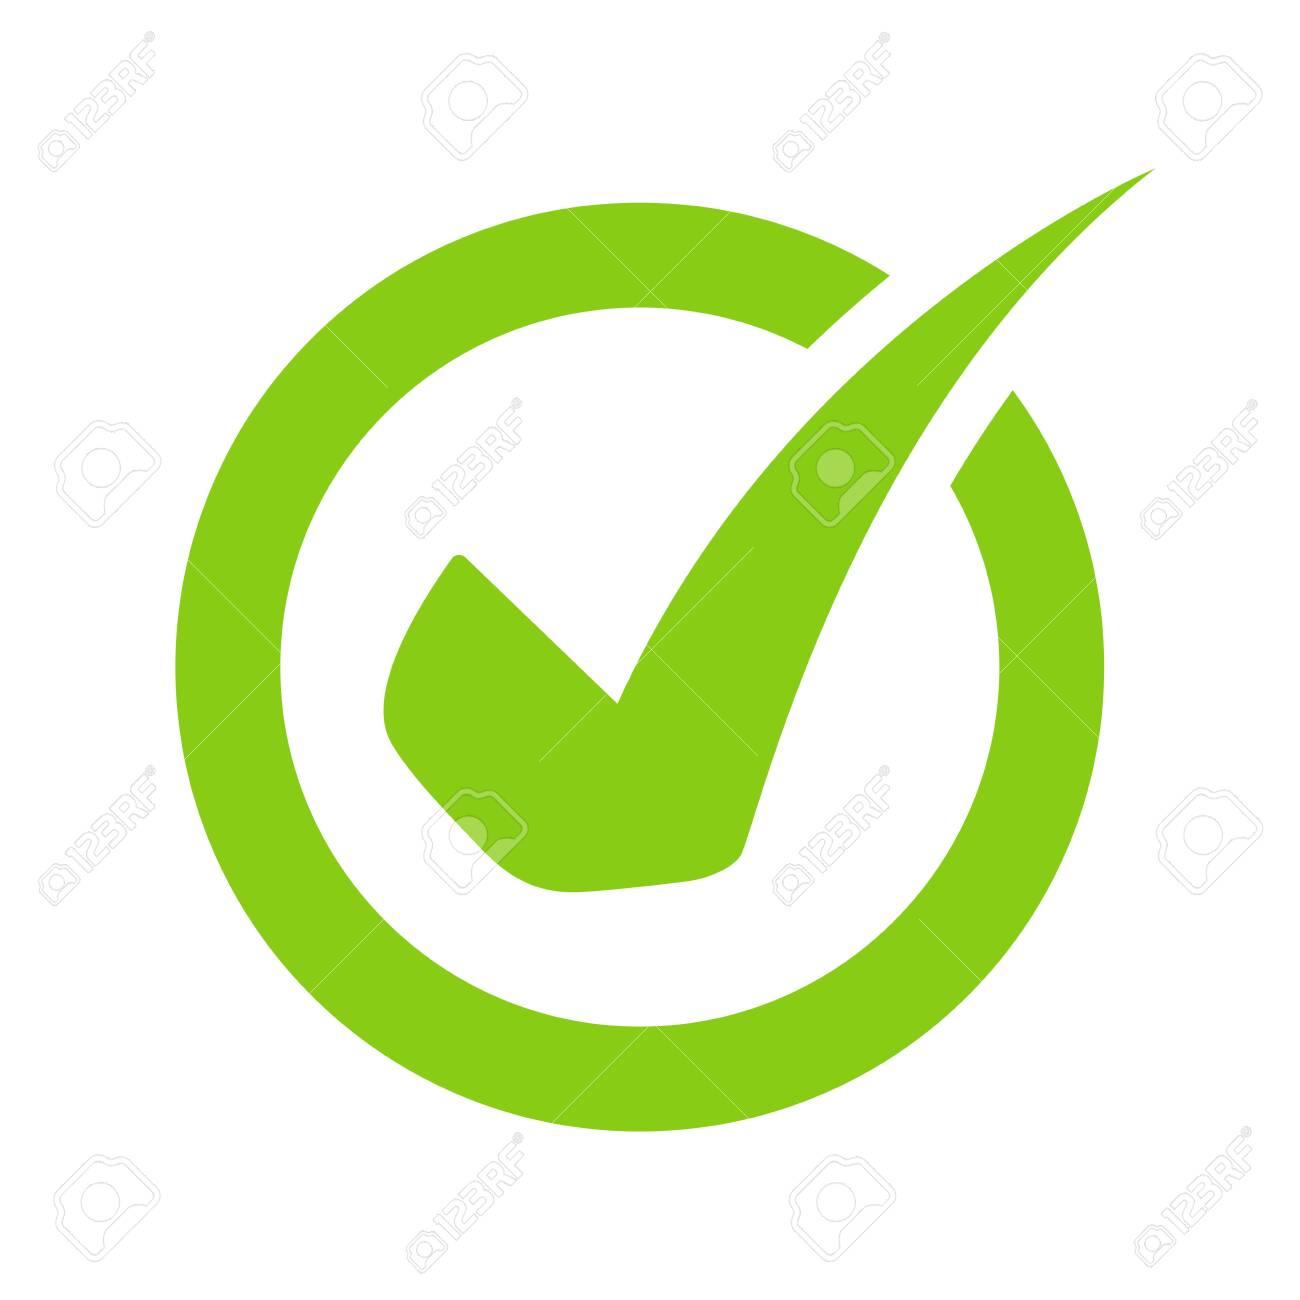 Green check mark icon vector On the circular checkbox For checking information - 153224662